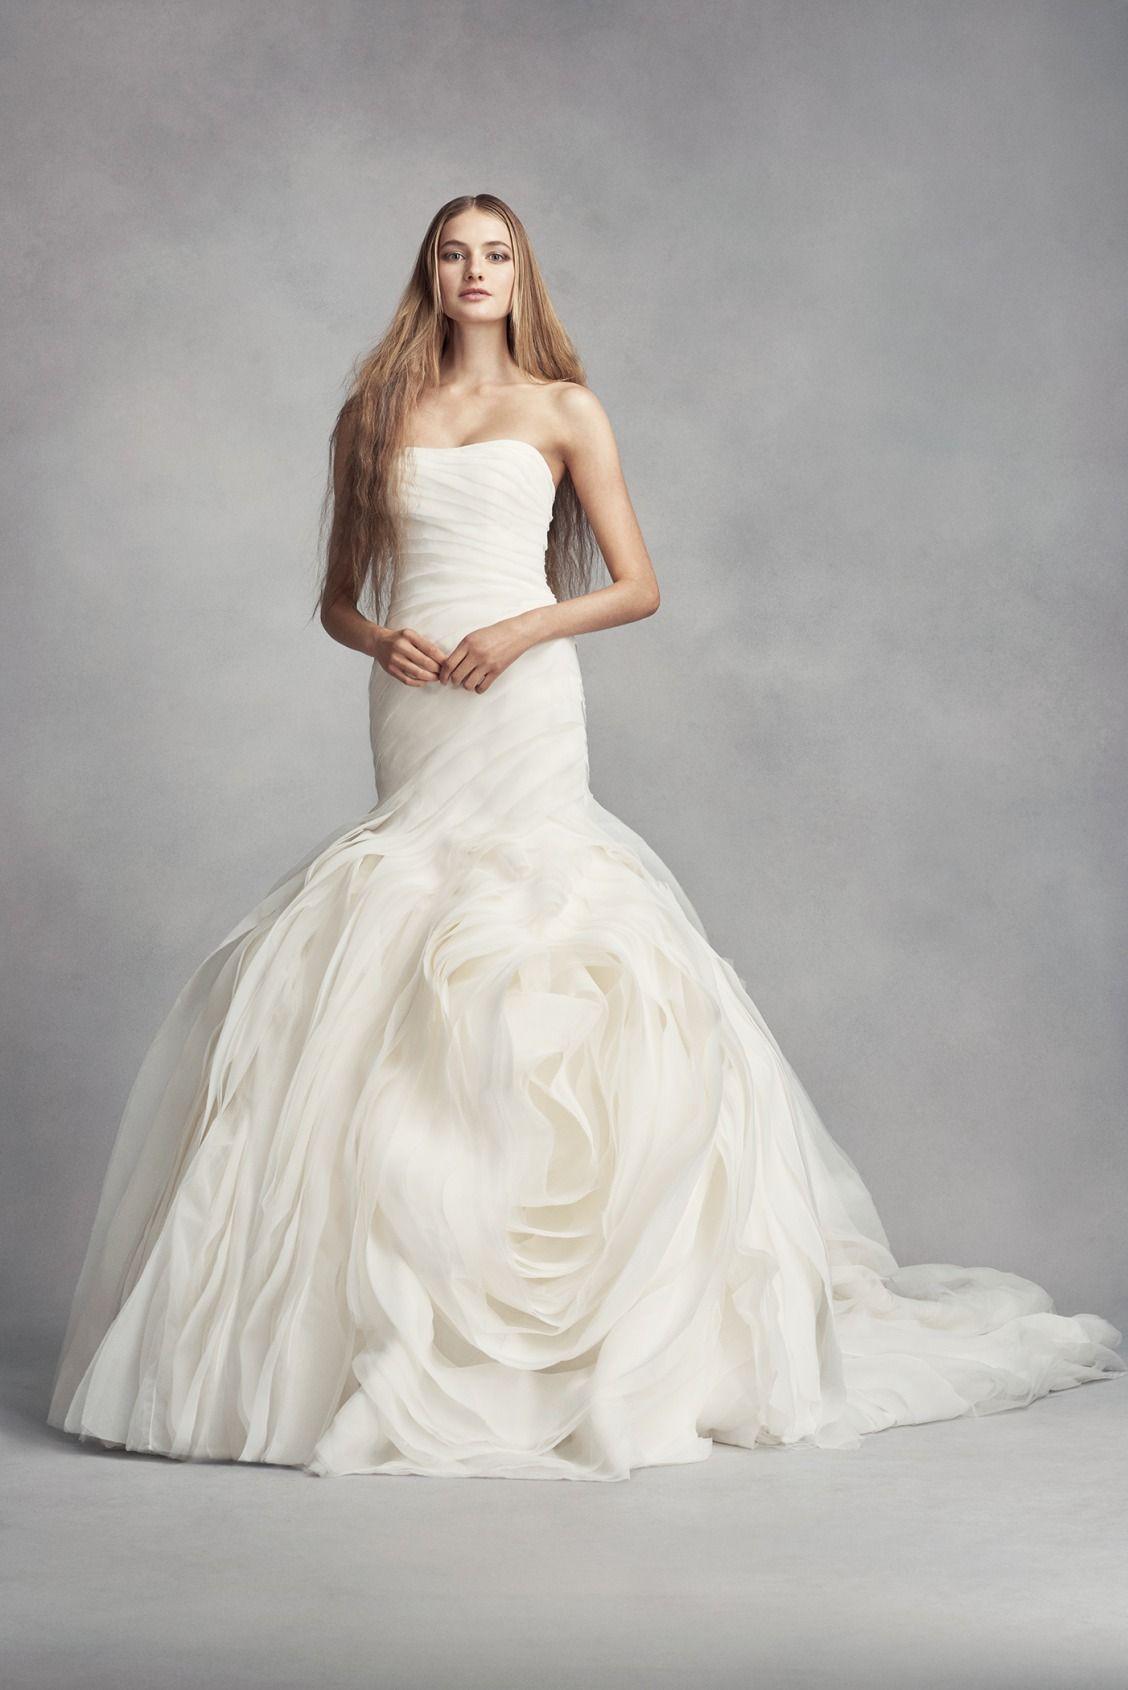 custom vera wang wedding dresses cost » Wedding Dresses Designs ...